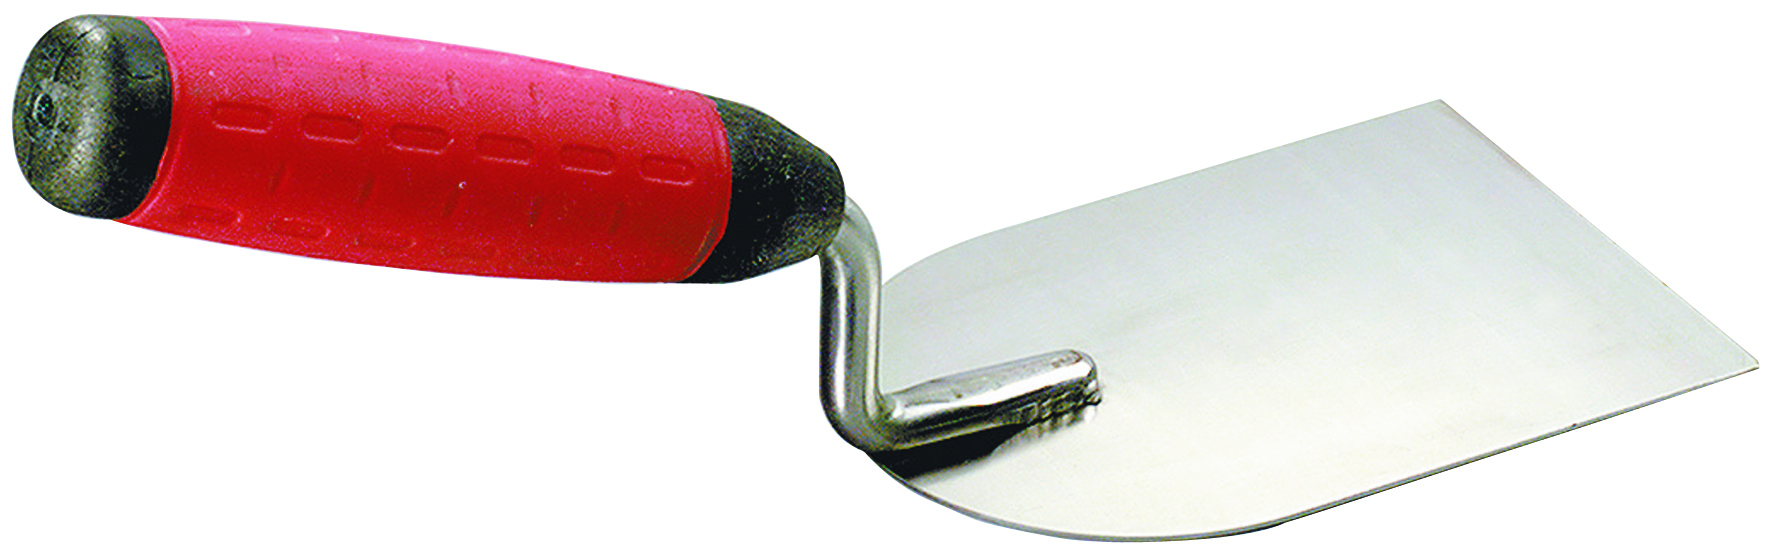 mip-tools.de profiwerkzeuge | kaufmann gipsspachtel rostfrei